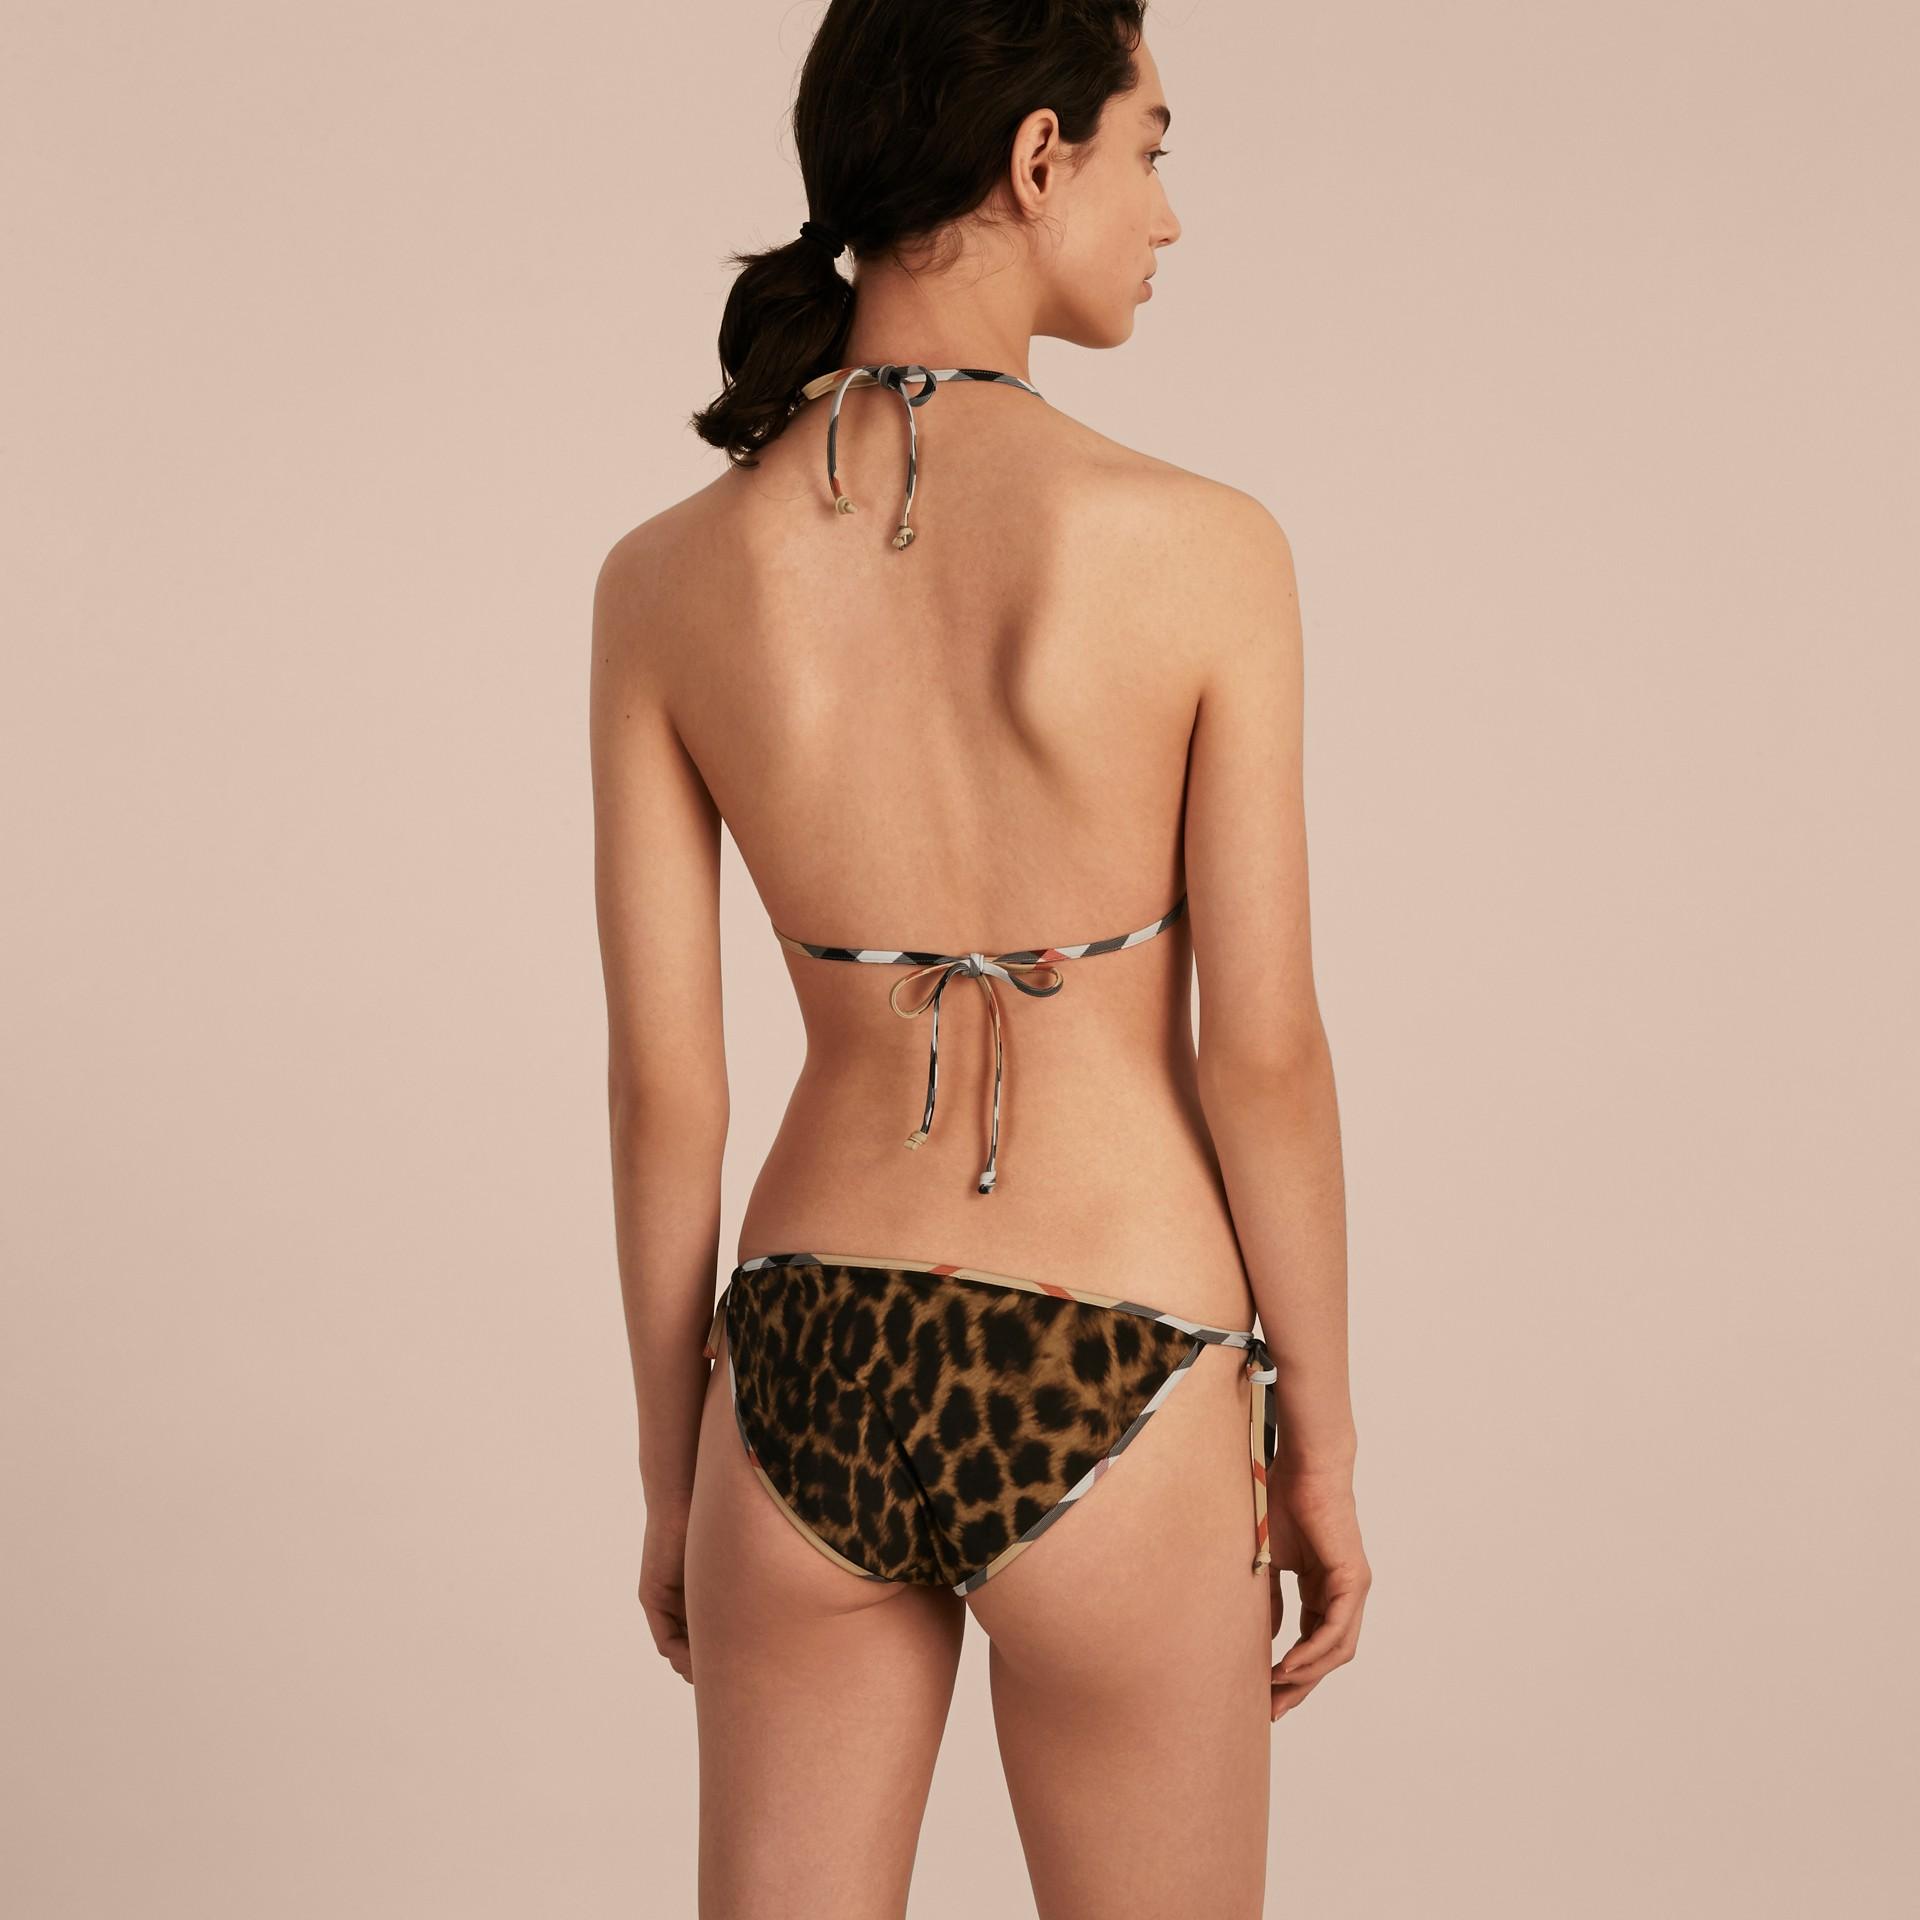 Animal Print Triangle Bikini with Check Trim - gallery image 3